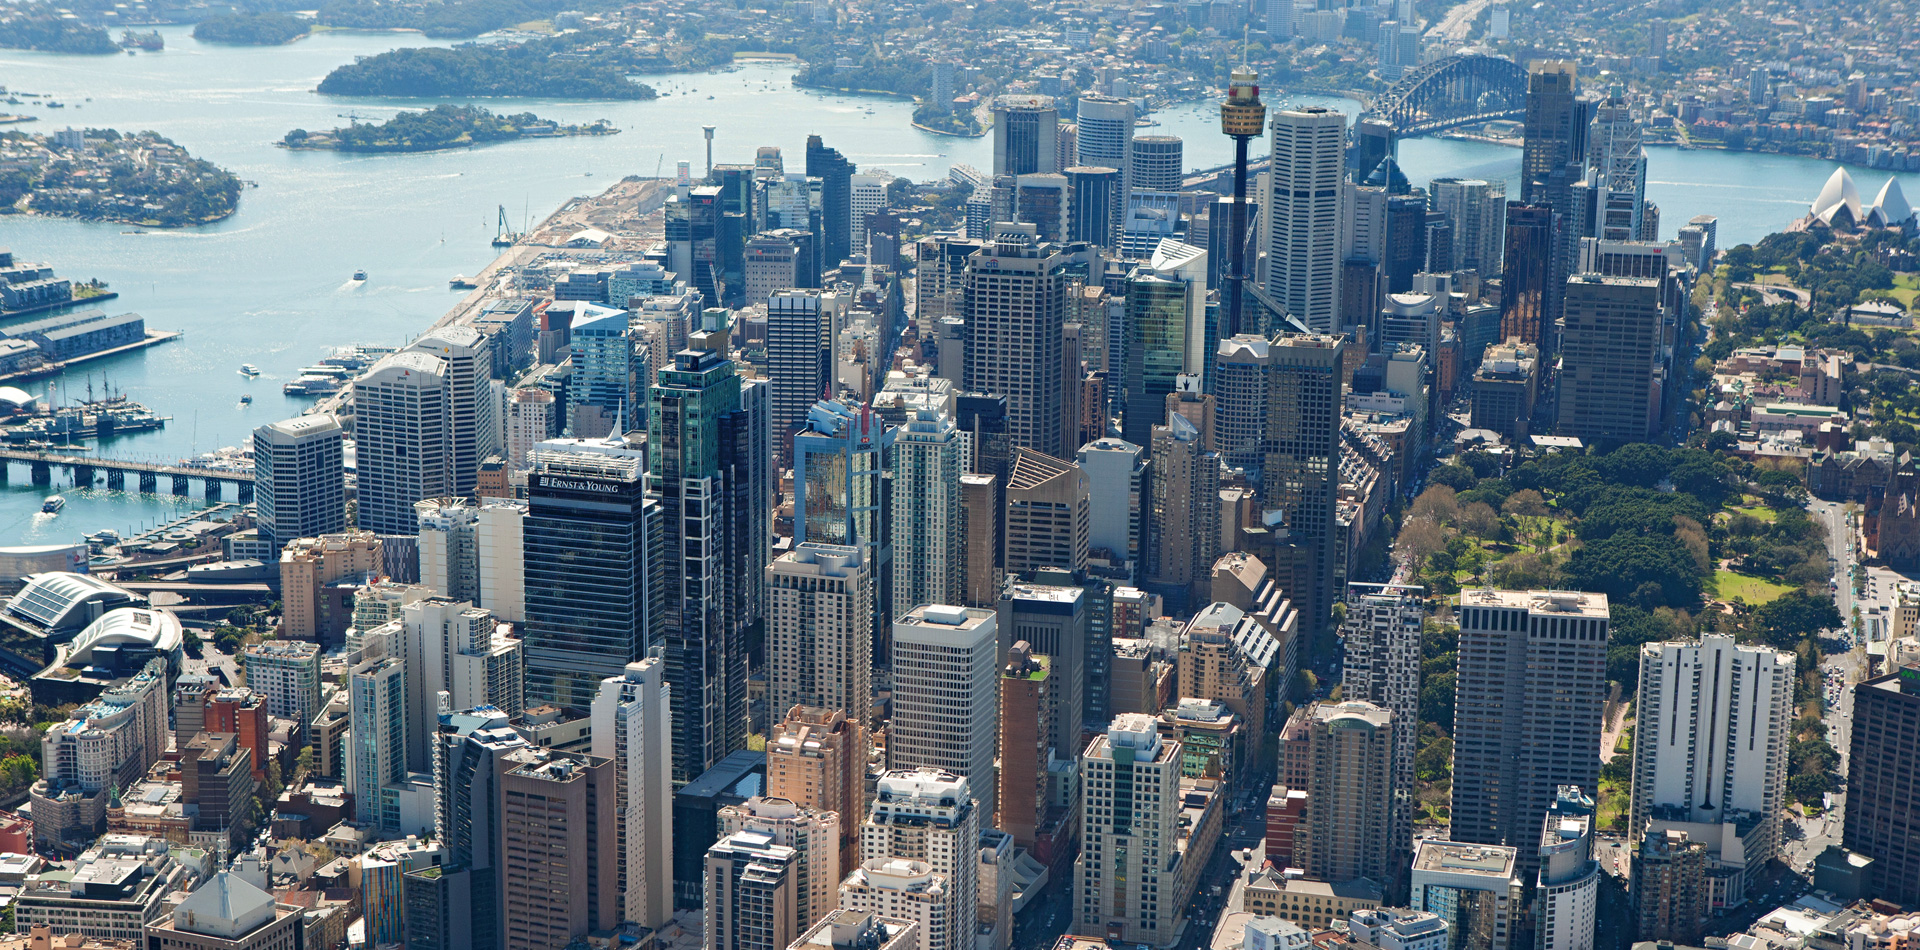 Aerial shot of the Sydney CBD